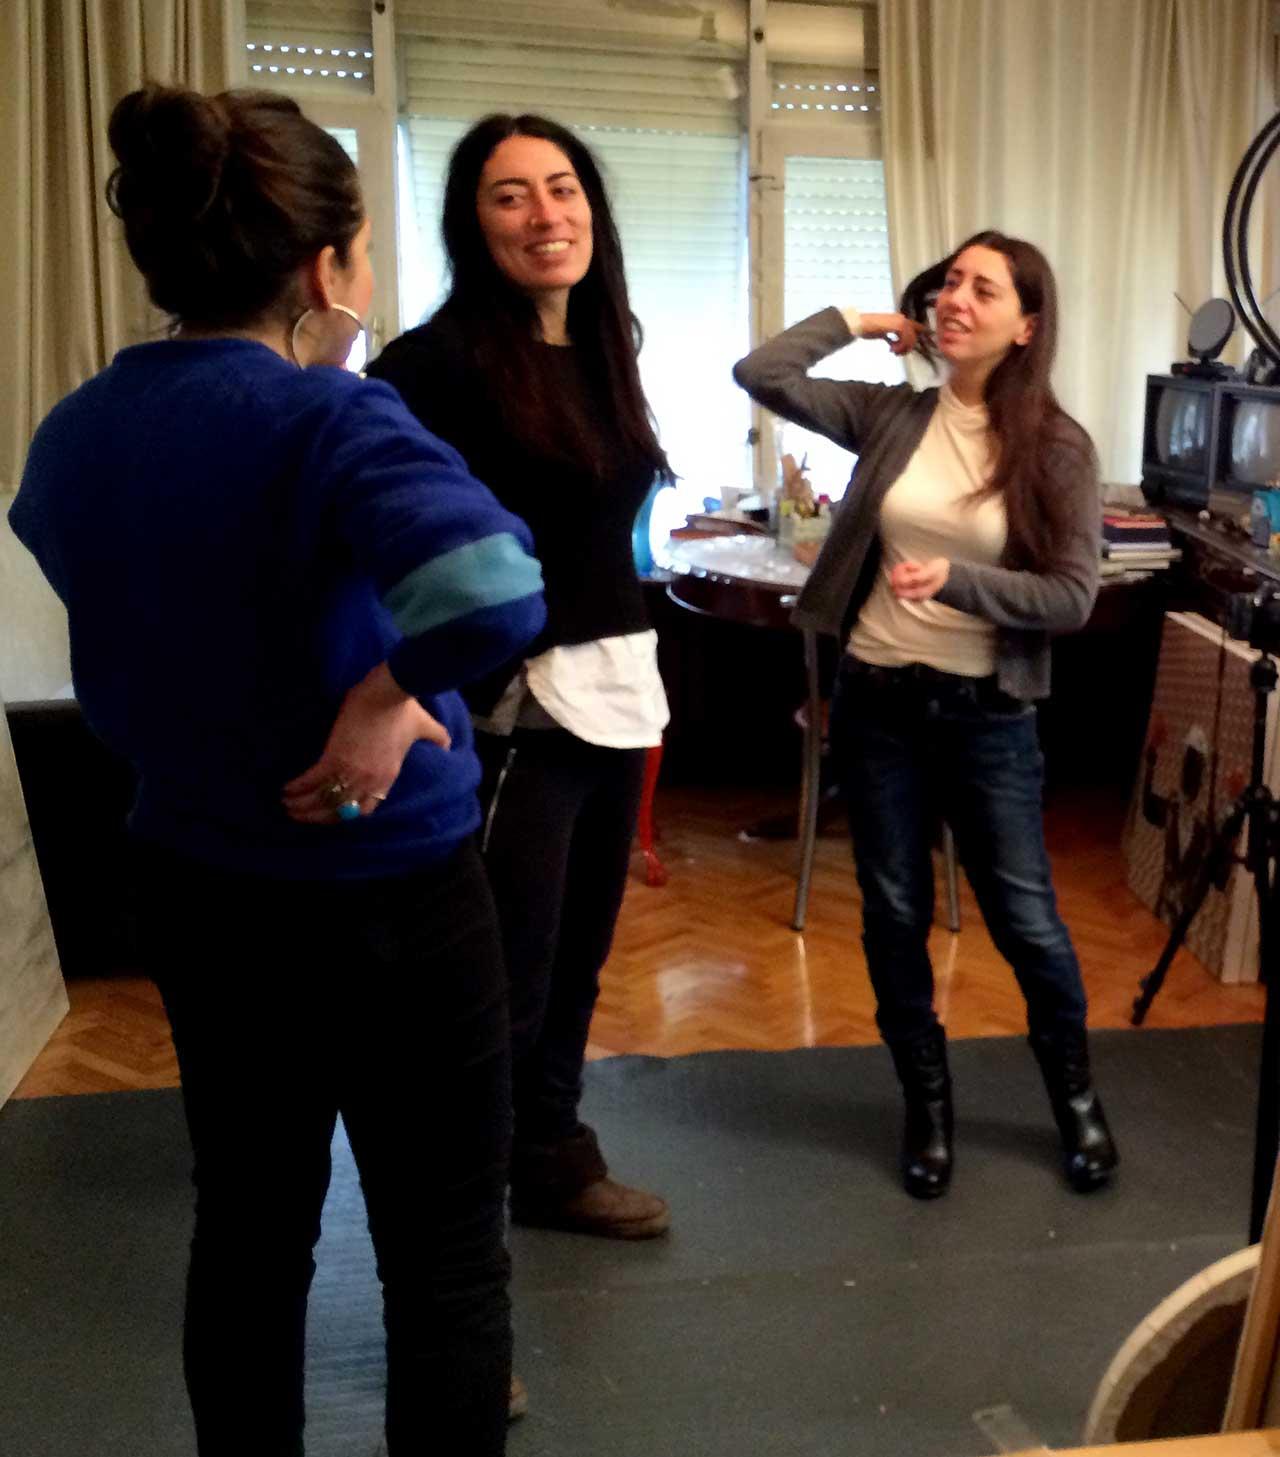 Artists (left to right) Bahar Yurukoglu, Olga Alexopoulou, and Beyza Boynudelik in Boynudelik's studio (click to enlarge)